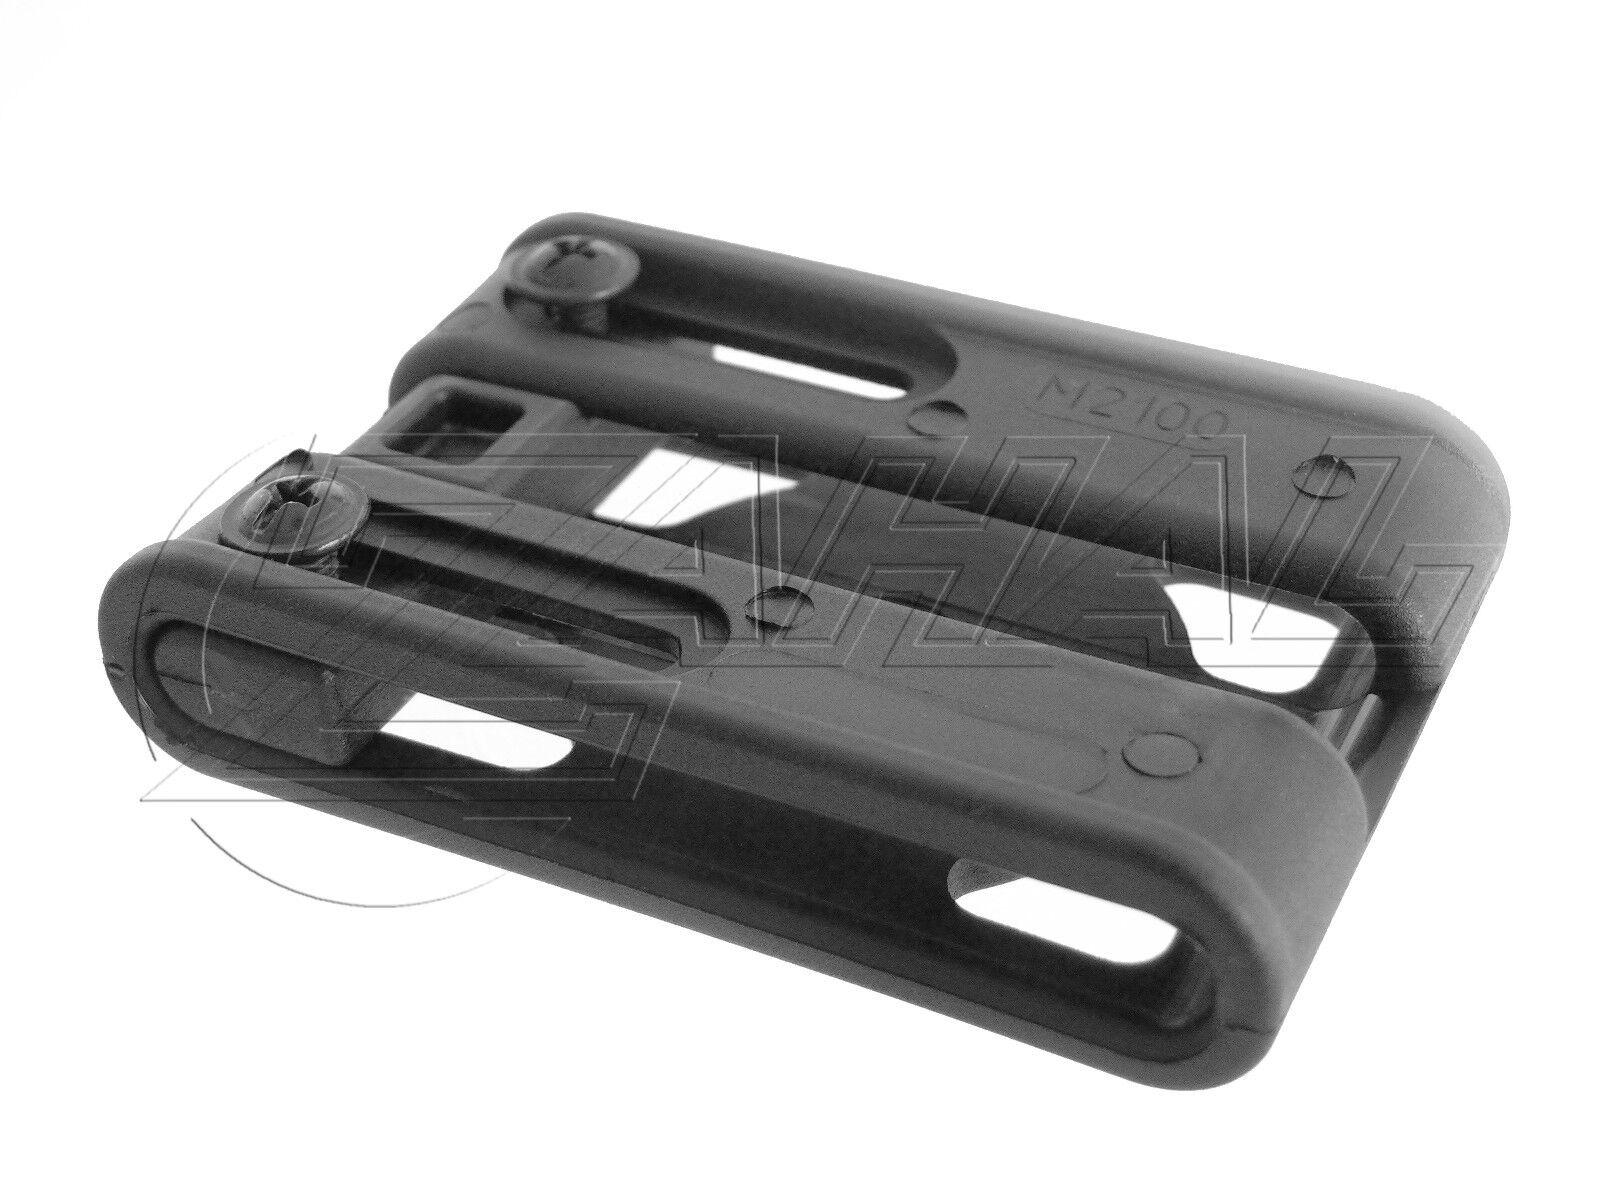 IMI Defense Retention Series Left Hand Holster for Taurus PT 800 Series Retention 809 IMI-Z1360LH cfba87